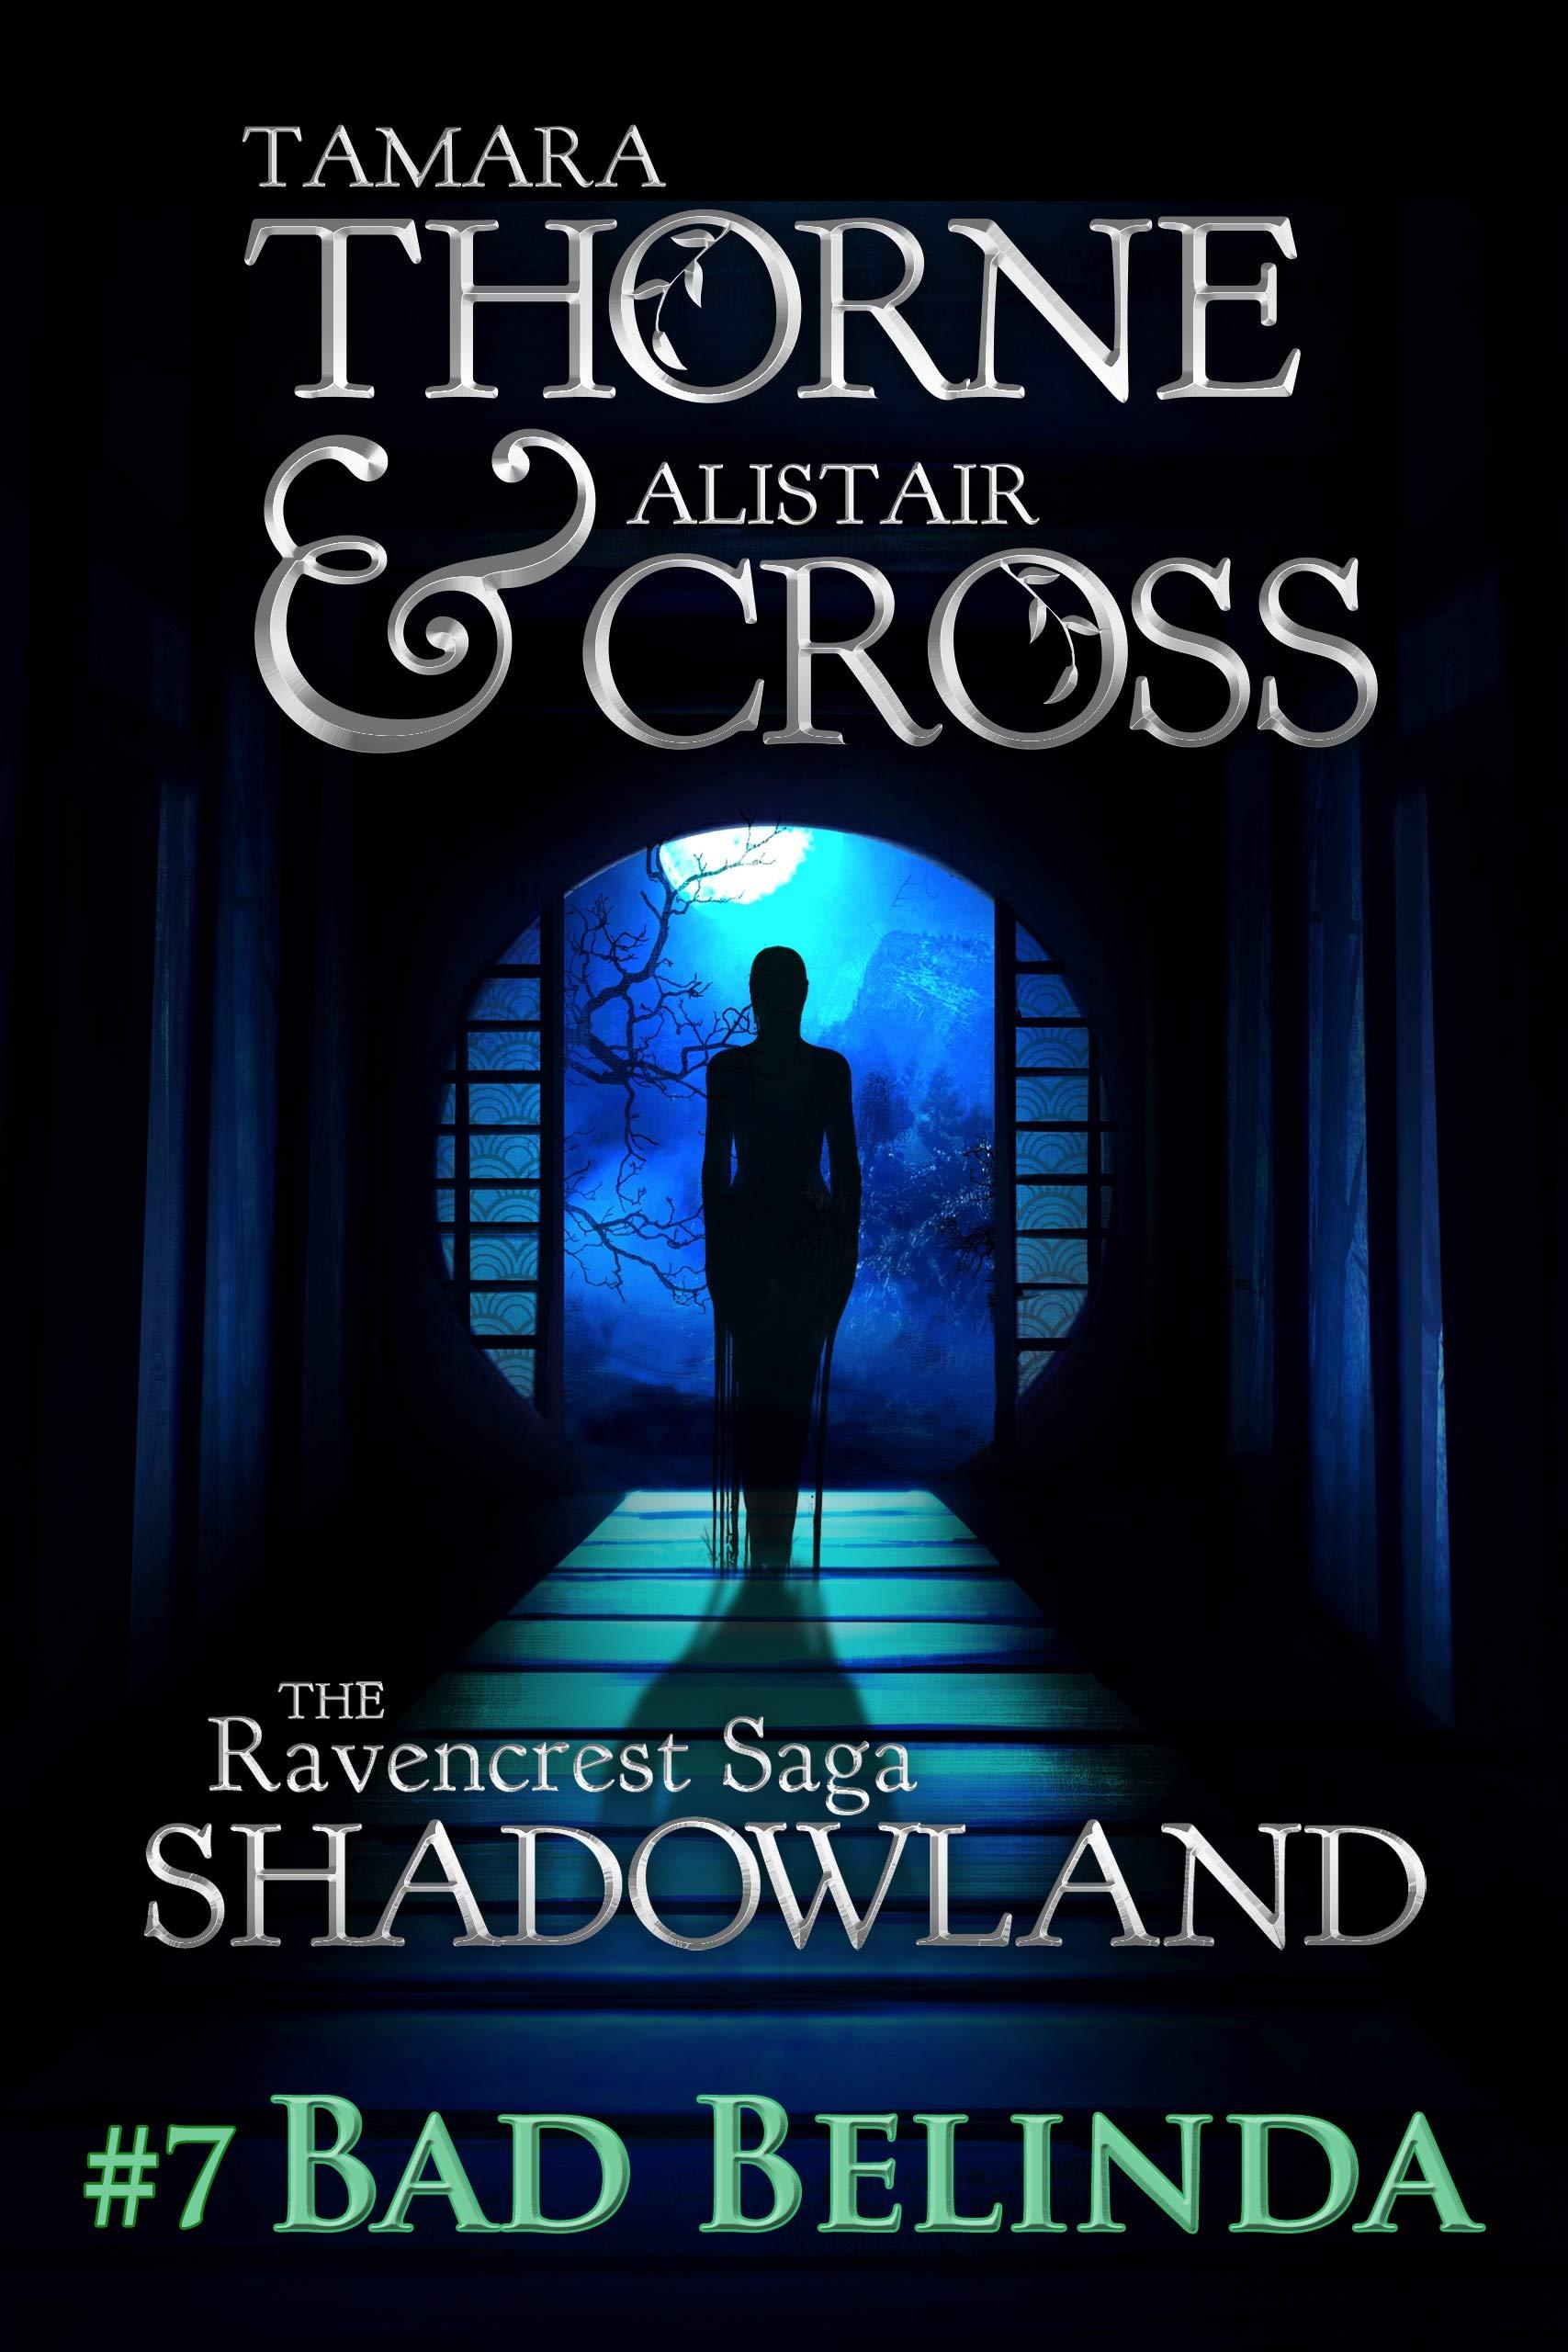 Bad Belinda: The Ravencrest Saga: Shadowland Part of 7